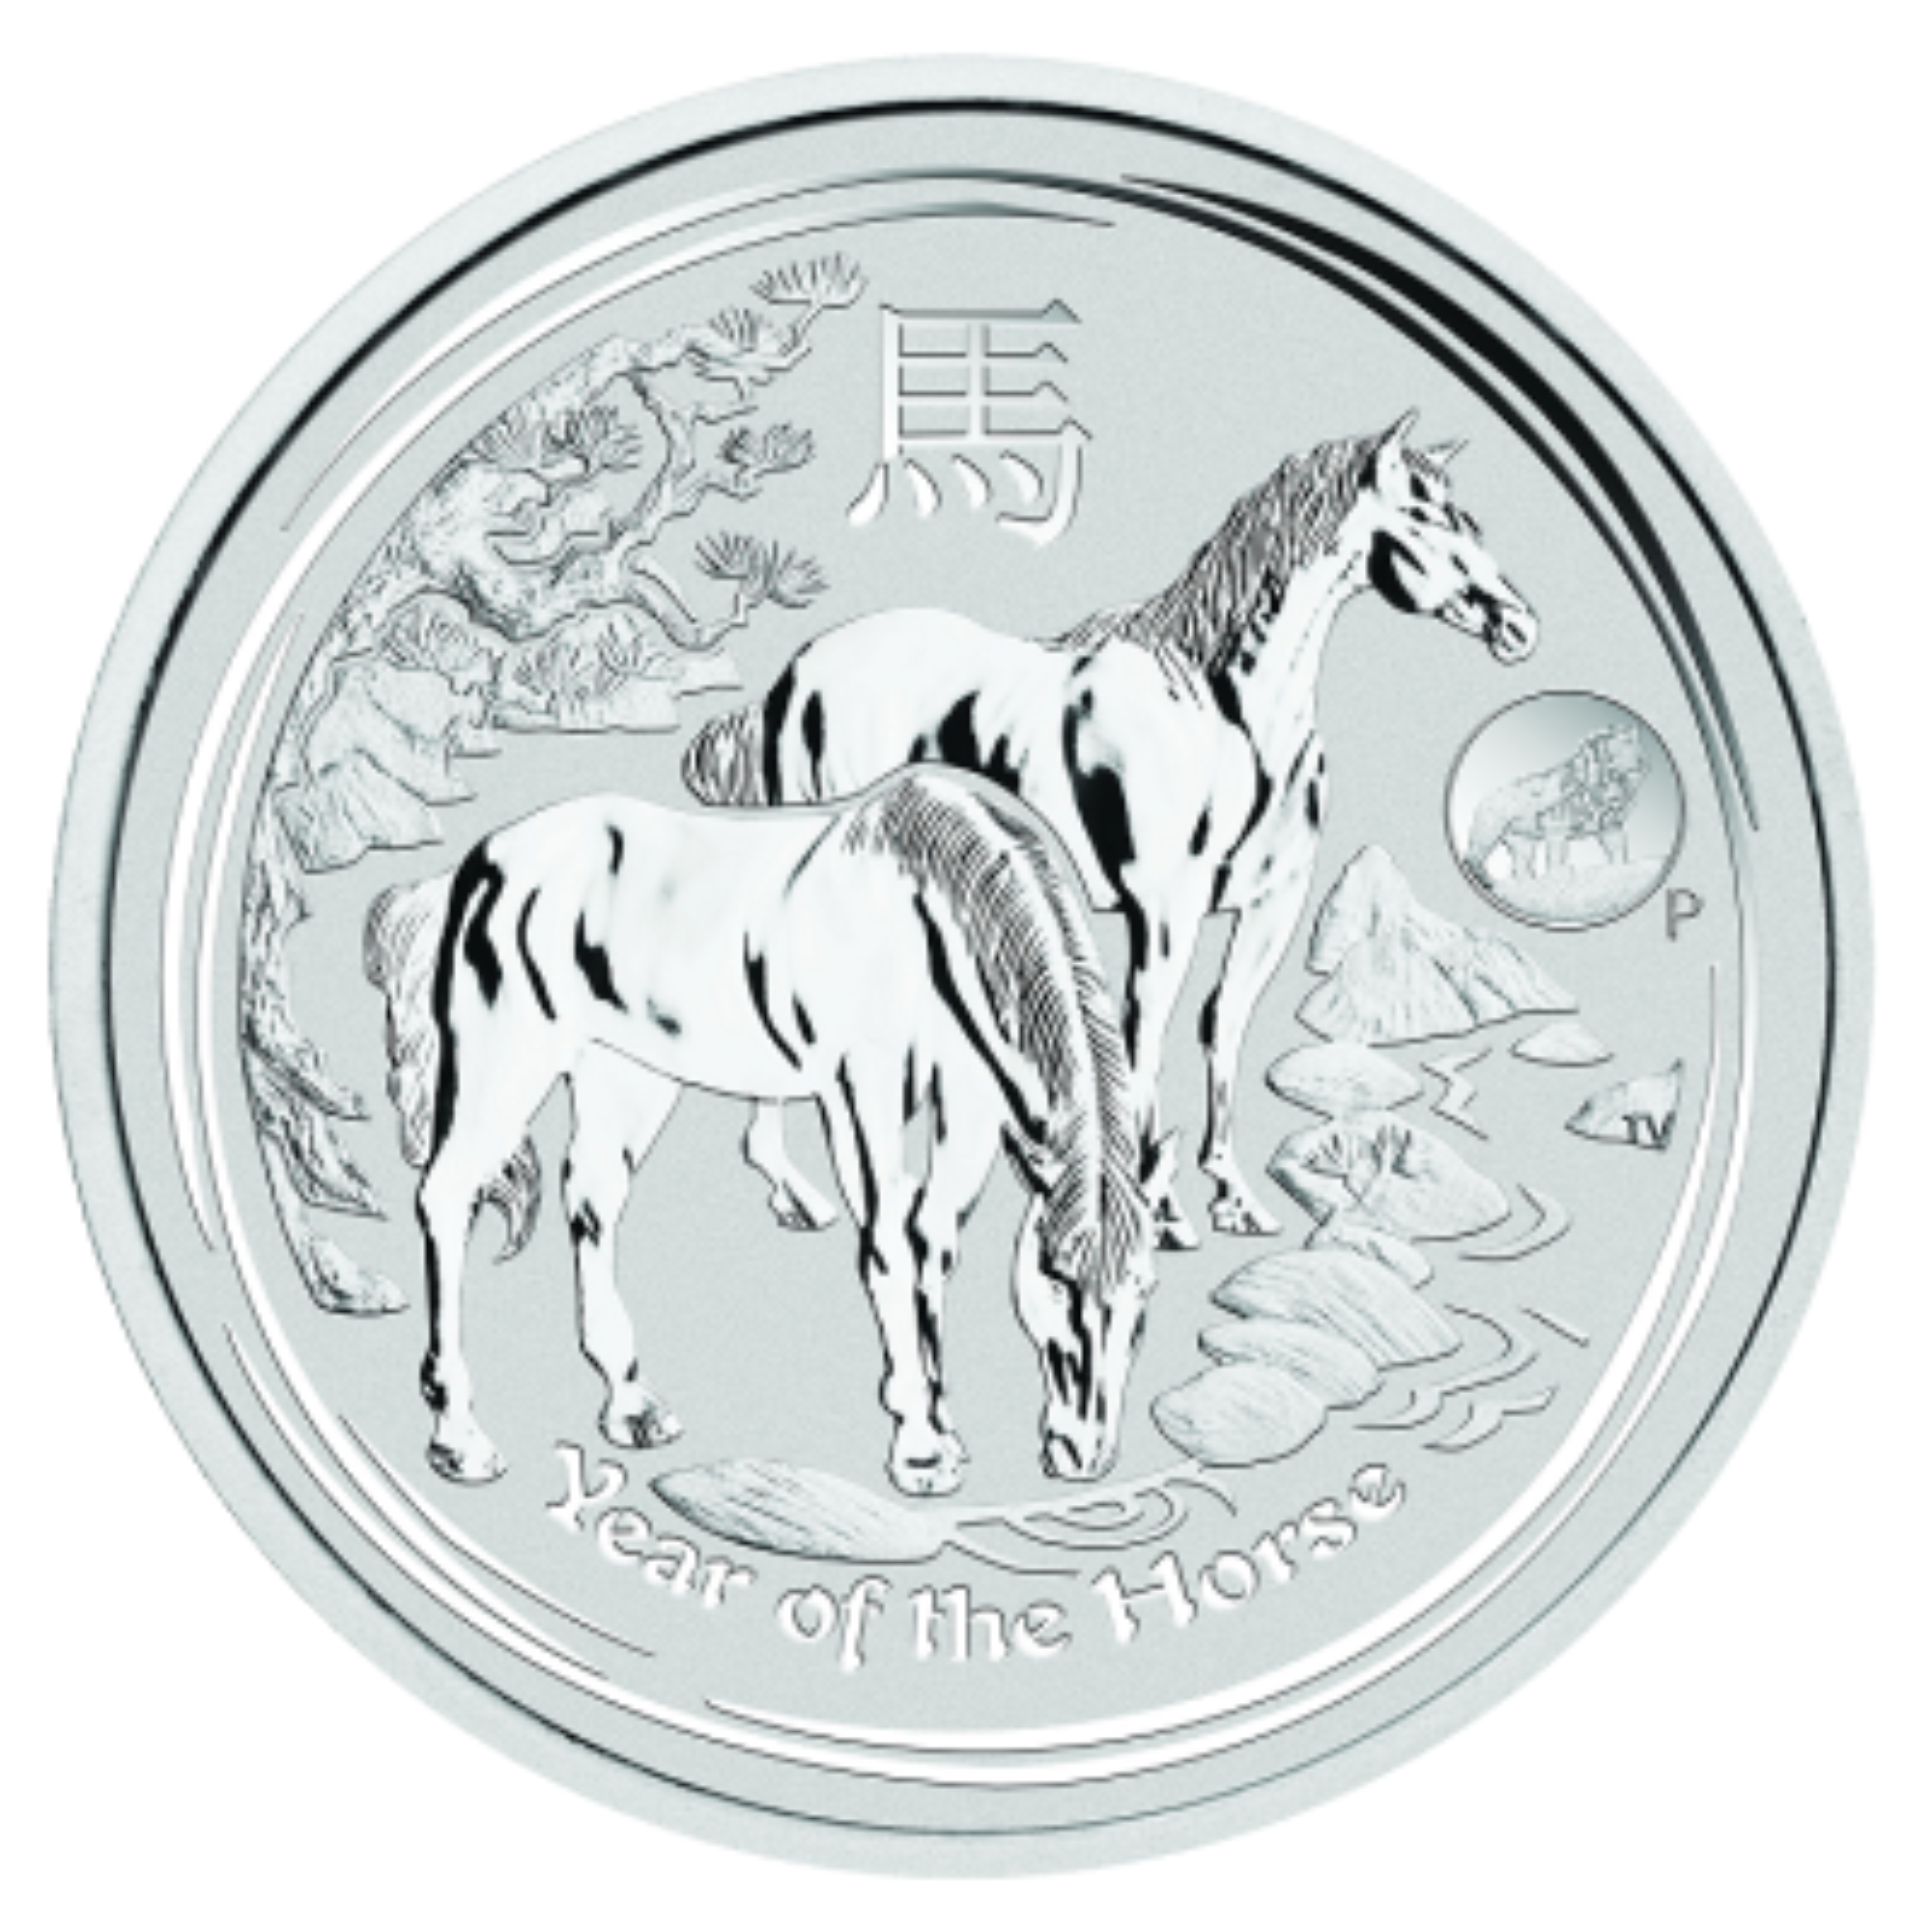 Privymark 1 ounce zilver Lunar munt 2014